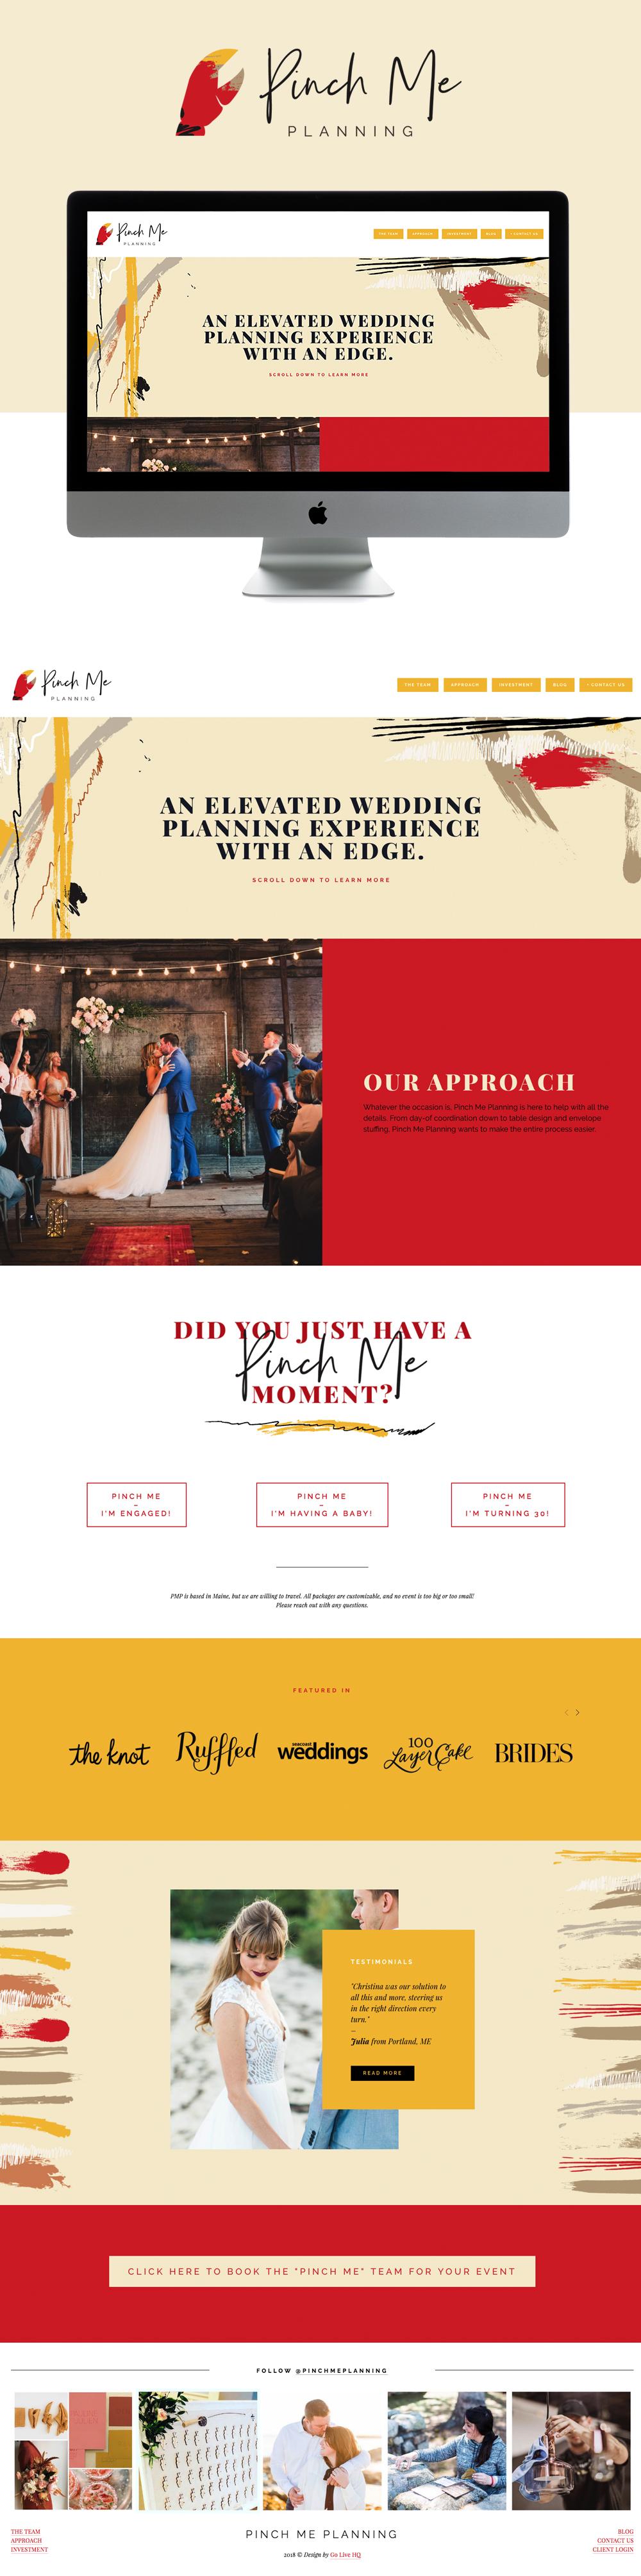 Modern, Edgy, Colorful Website Design for Wedding Planner | Design by Go Live HQ